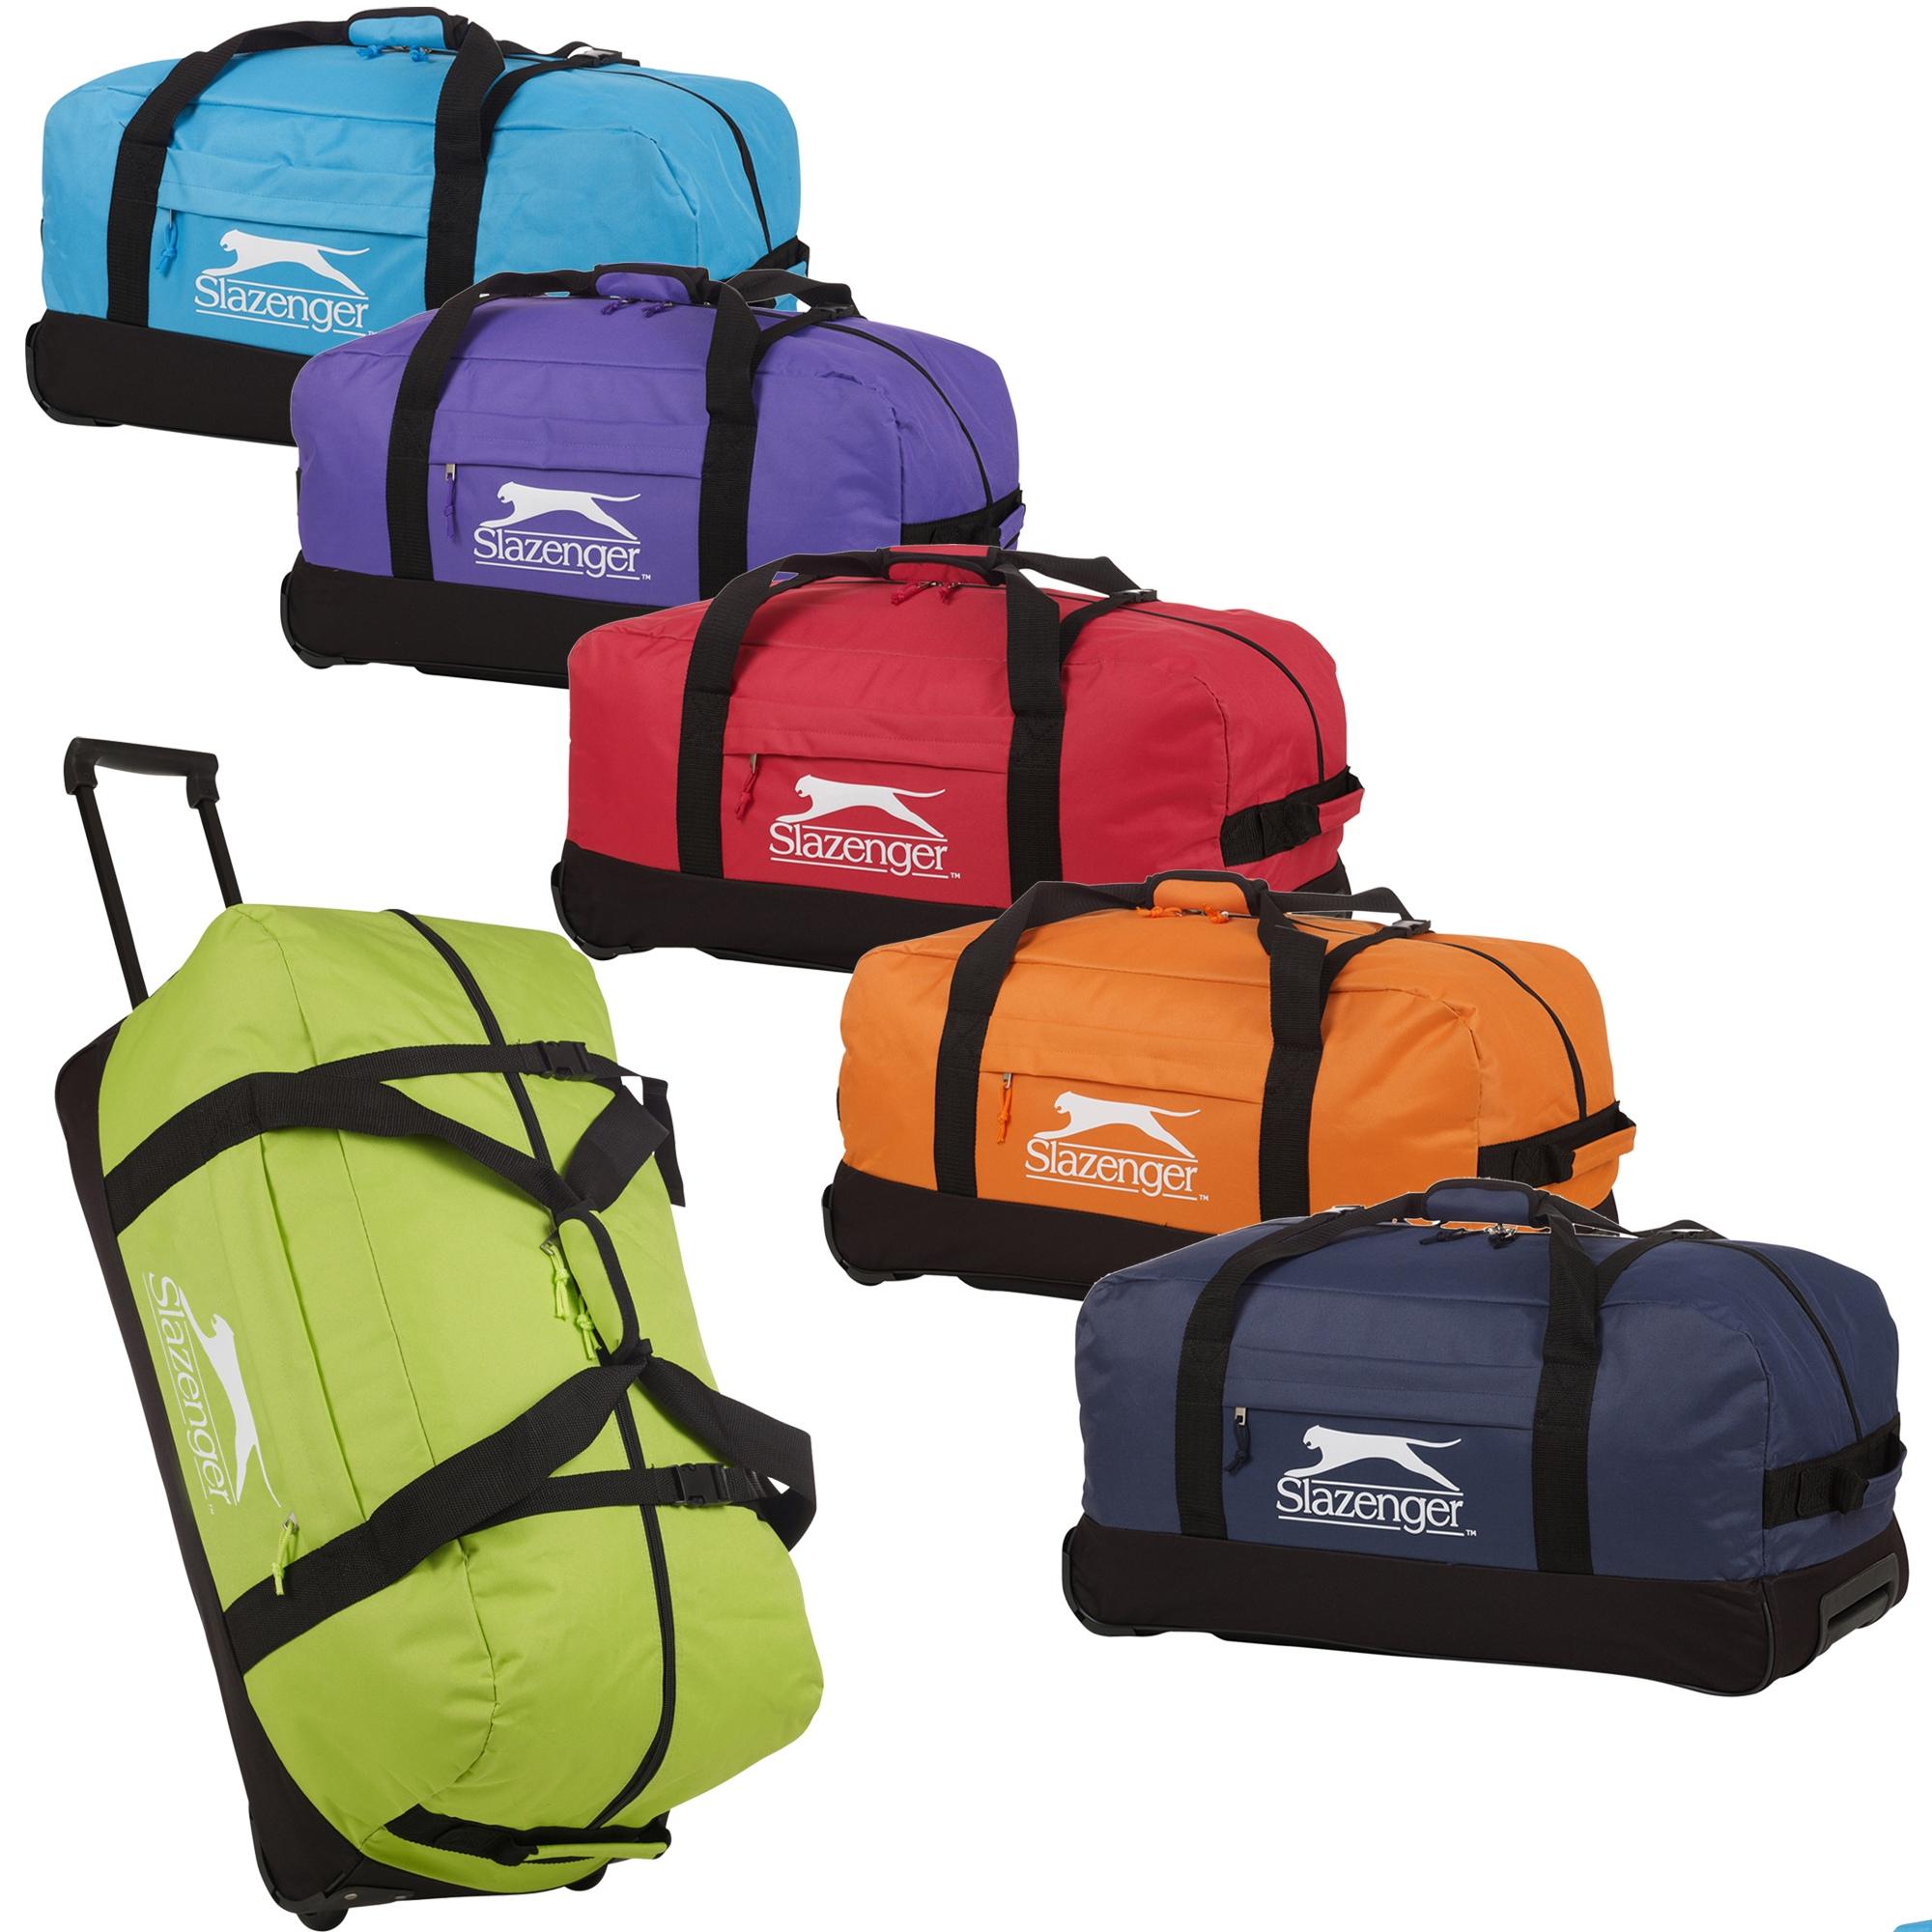 Slazenger Trolley Sports Travel Bag Handle